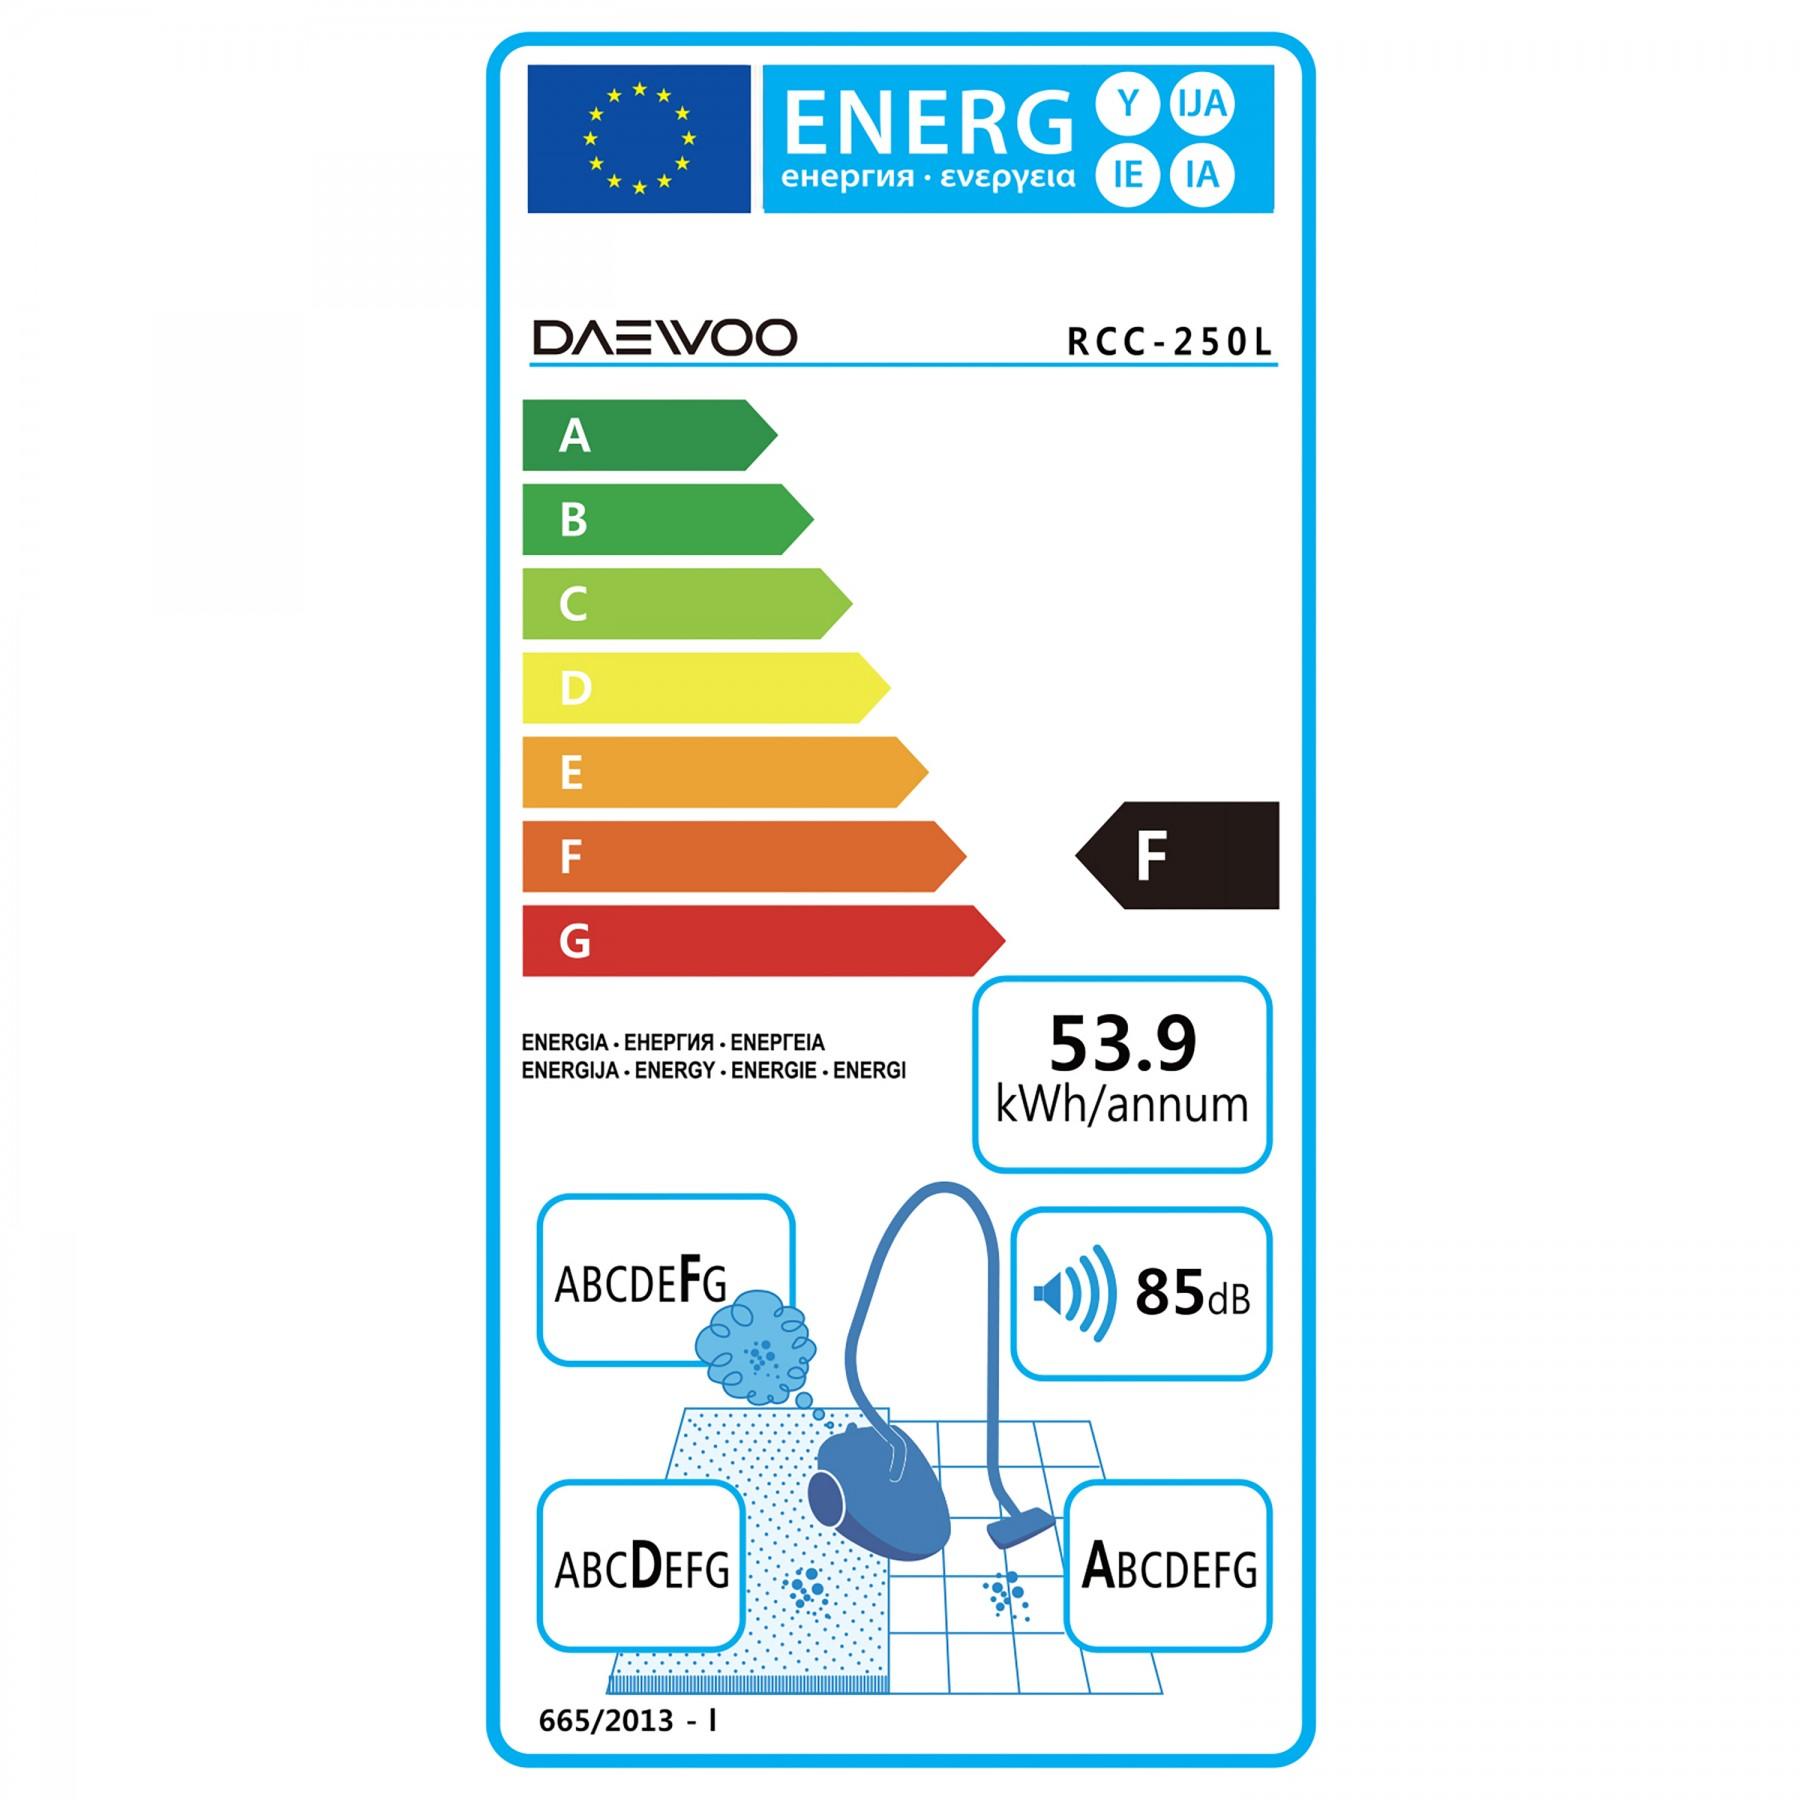 Daewoo Vacuum Diagram Blog About Wiring Diagrams Toyota Pickup 22re Electrical Honda